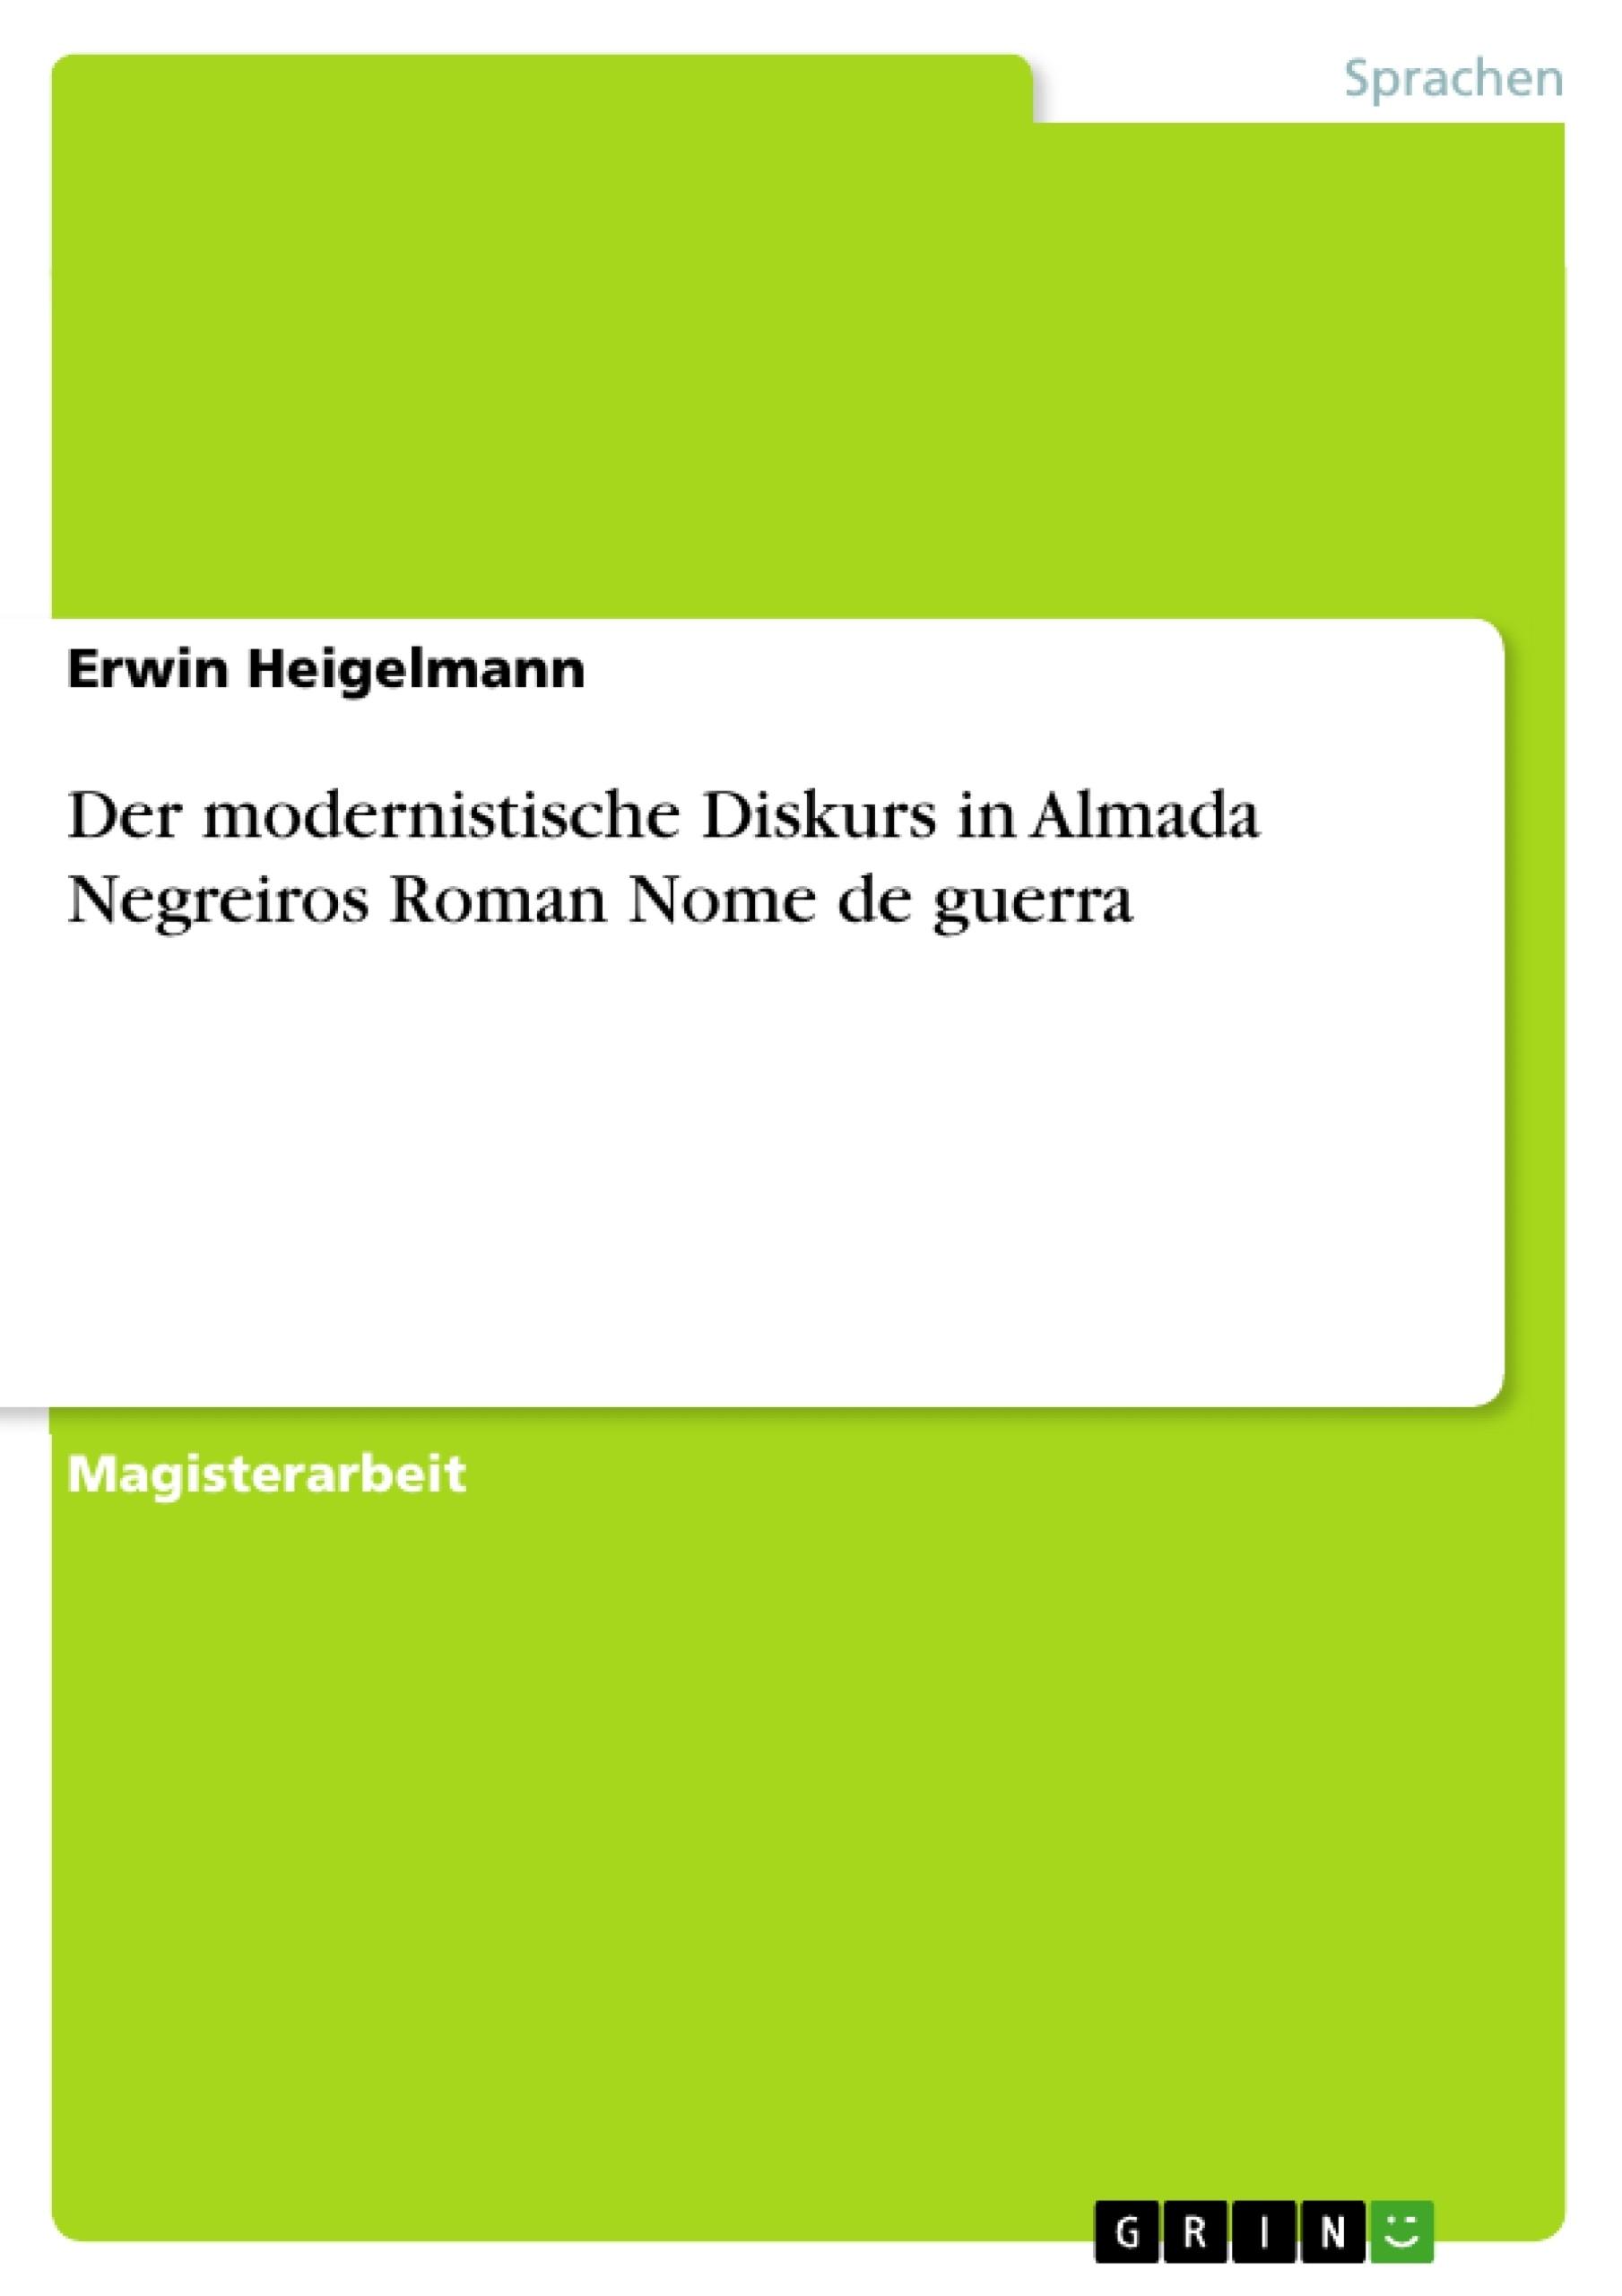 Titel: Der modernistische Diskurs in Almada Negreiros  Roman  Nome de guerra